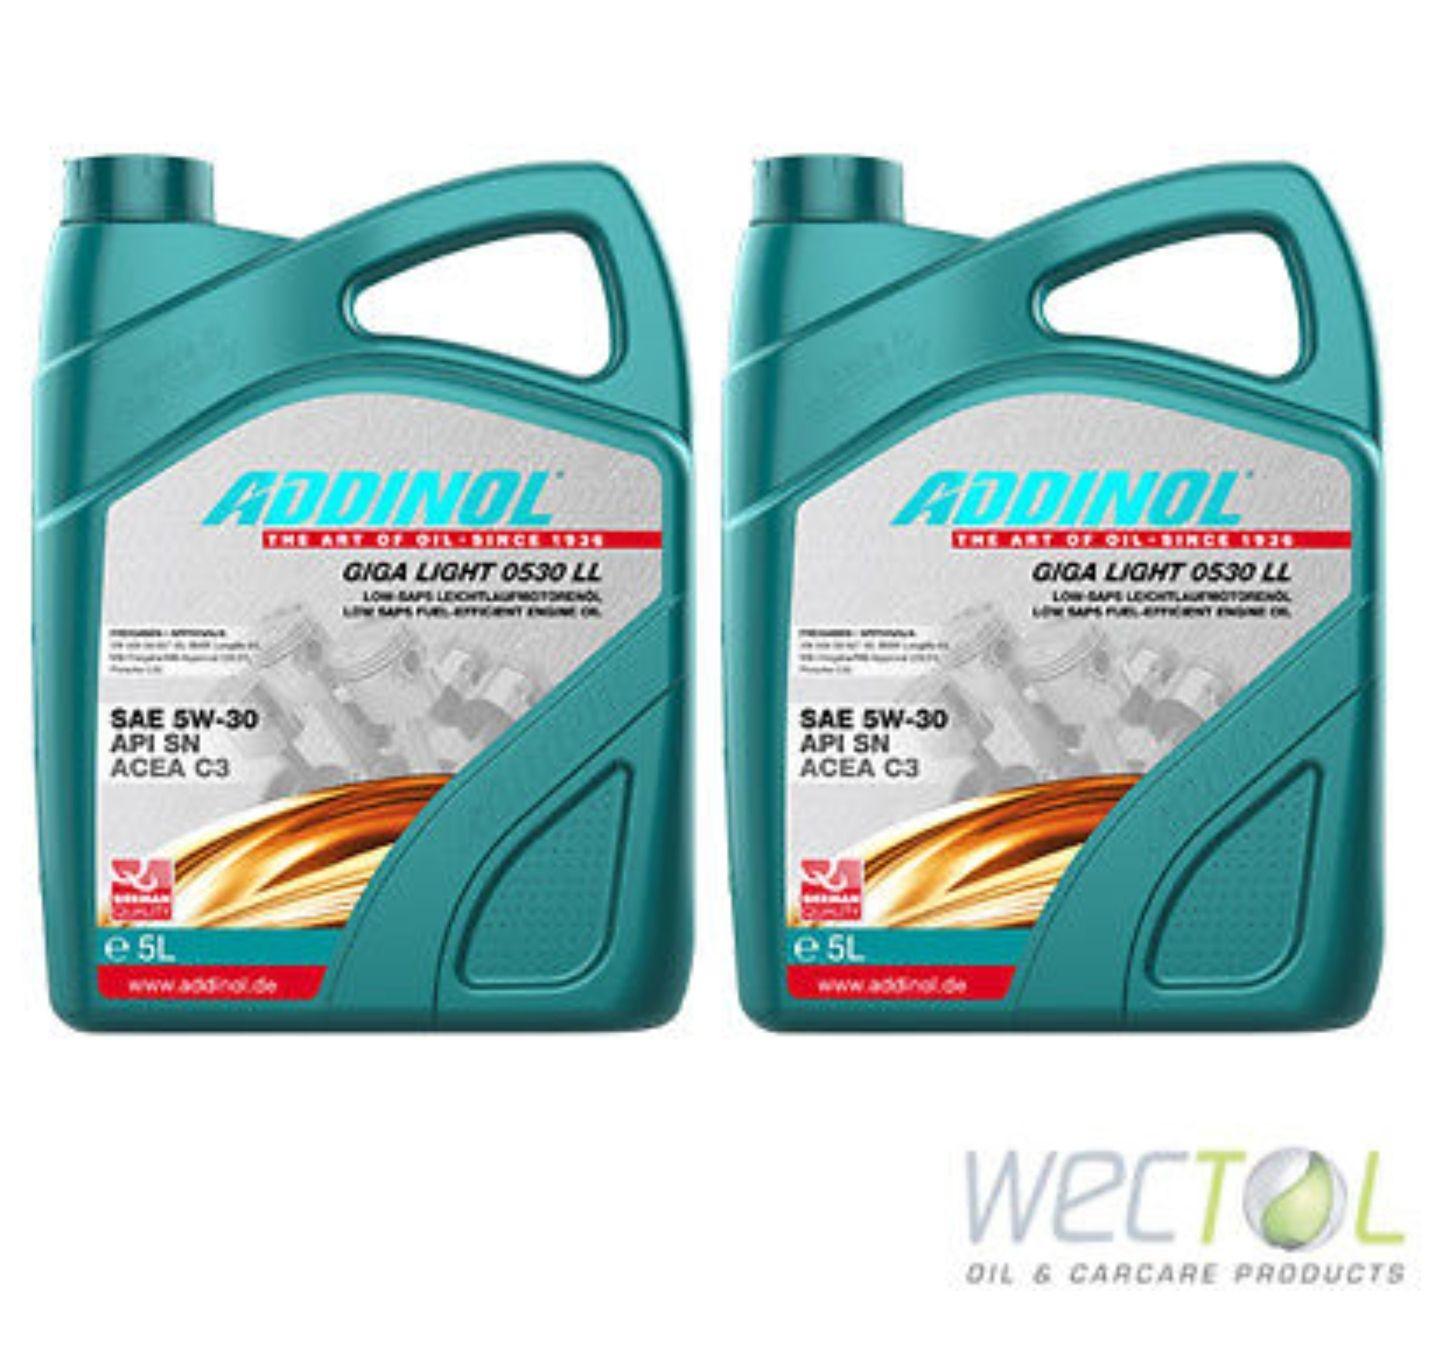 [Ebay] 10 L 10 Liter Addinol GIGA LIGHT MV 0530 LL 5W-30 Motoröl für viele VW Audi MB 2x5